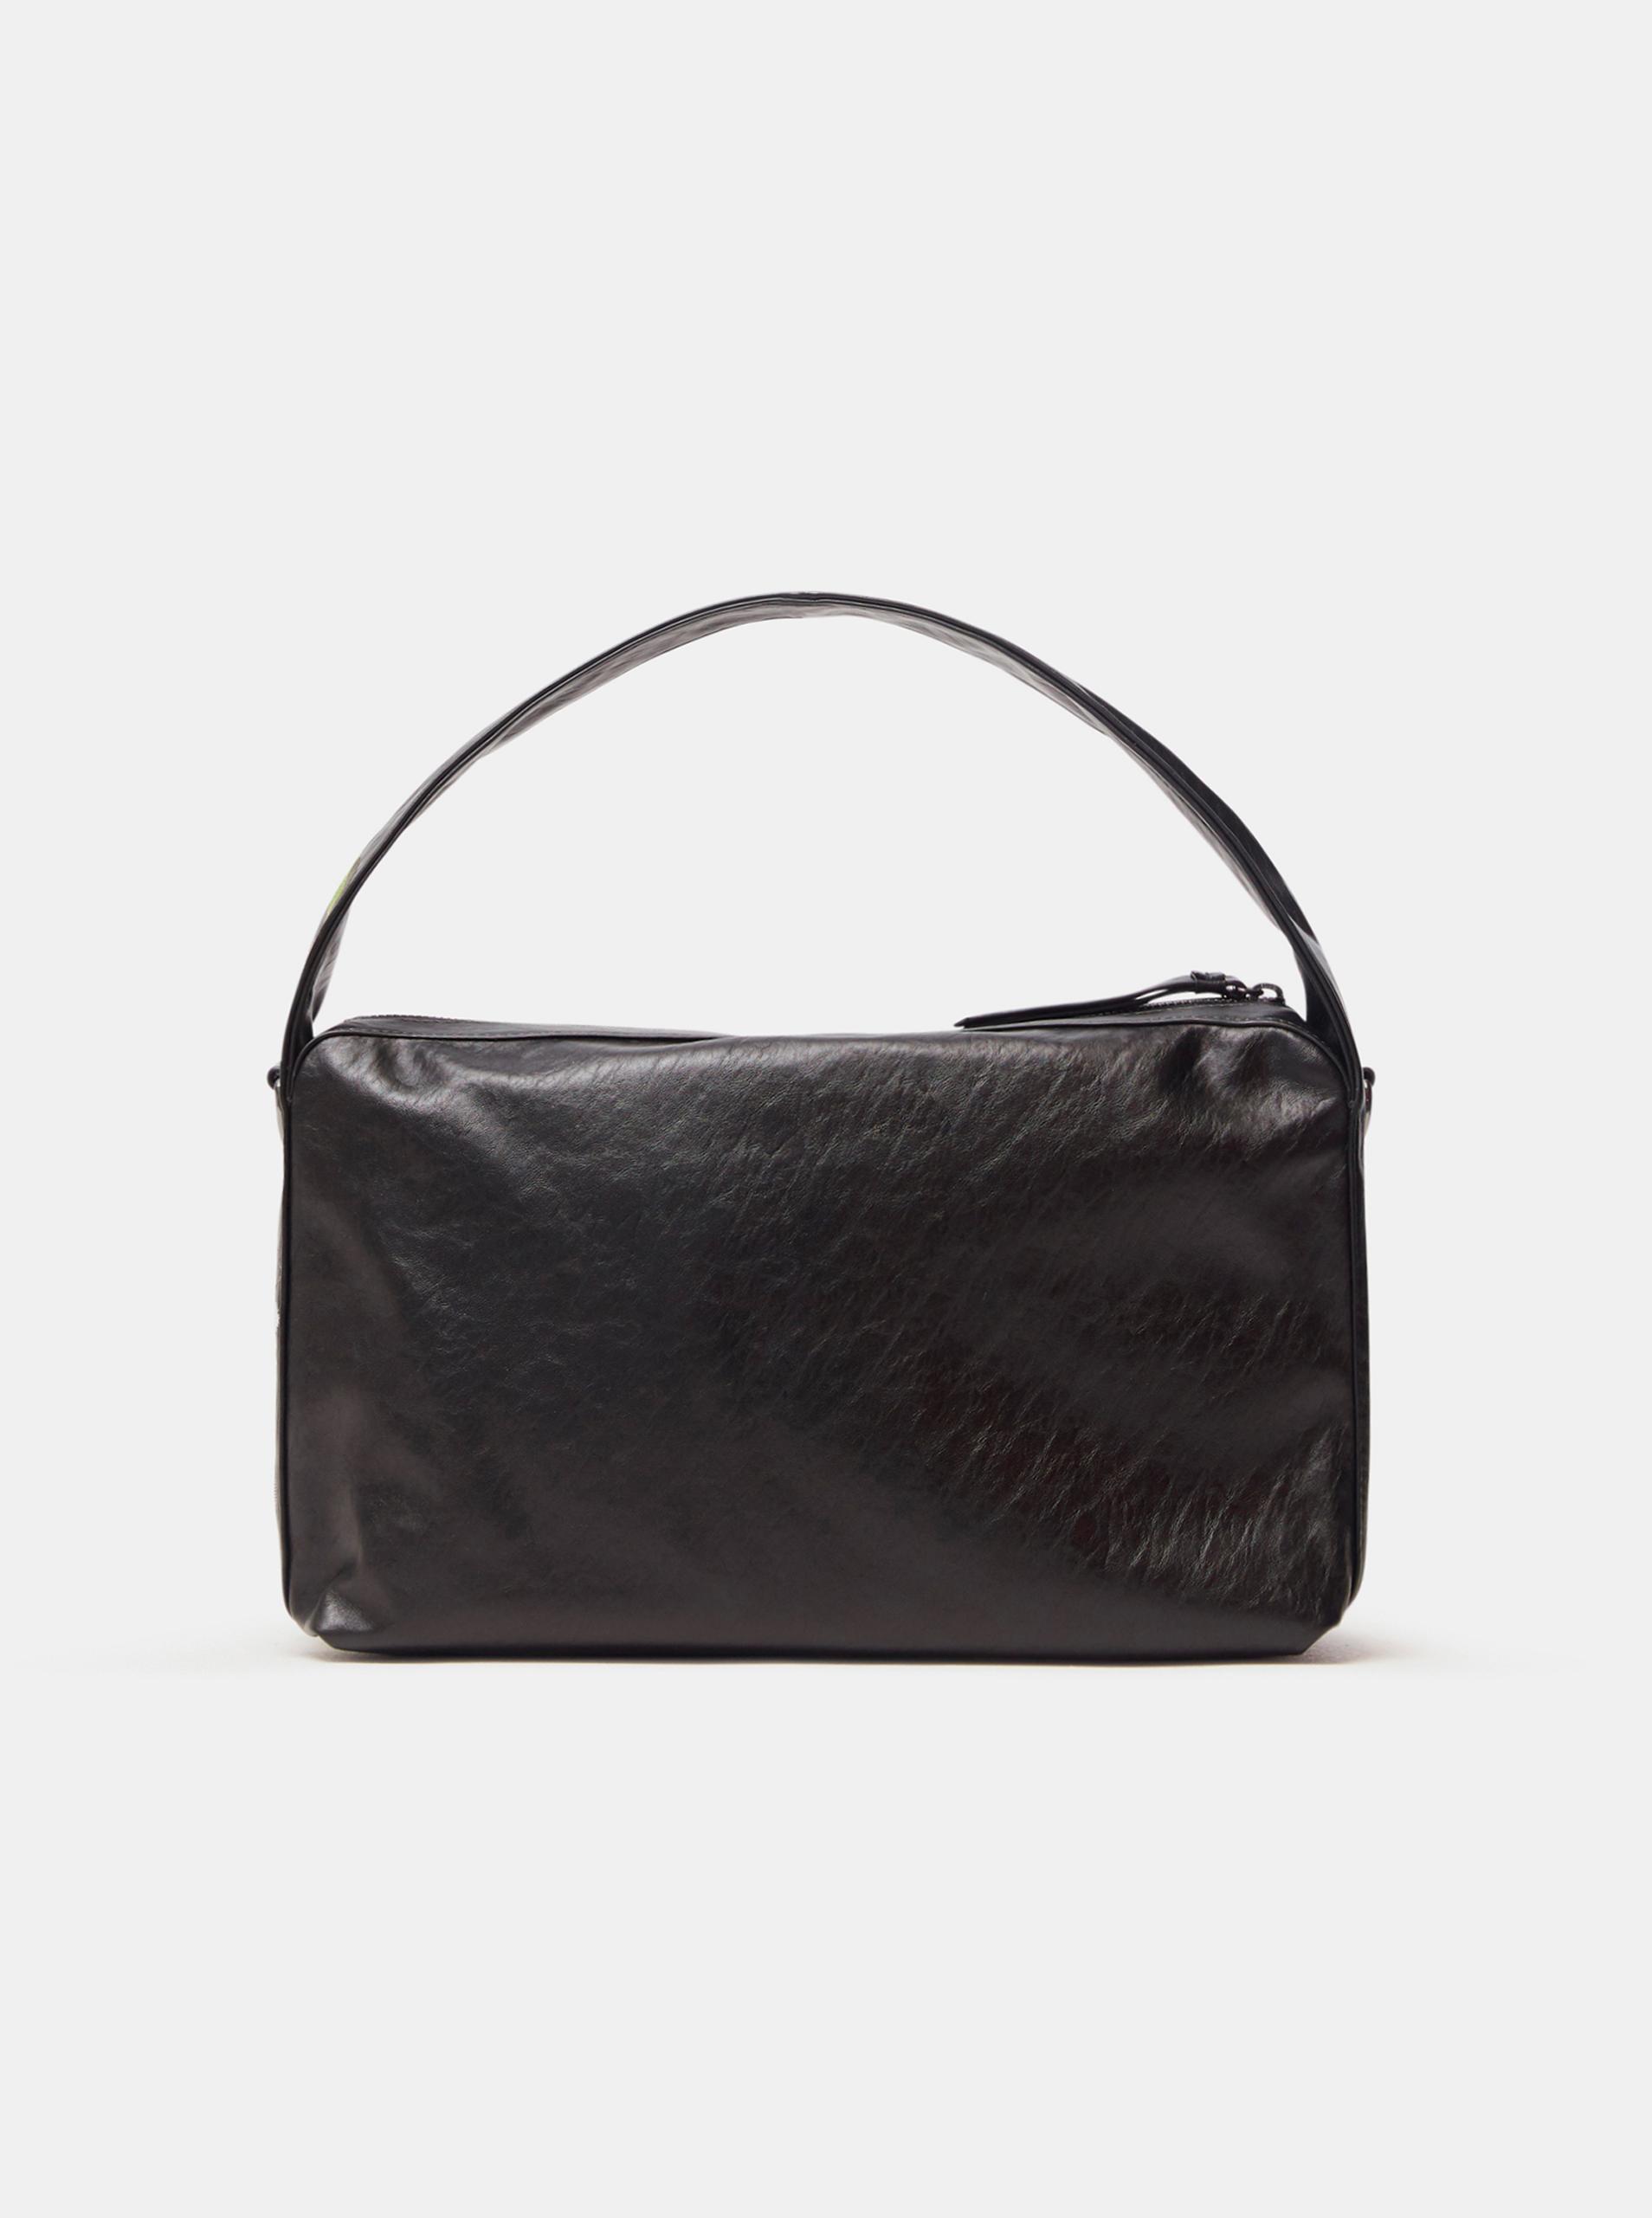 Desigual black handbag Niagara Narbonne